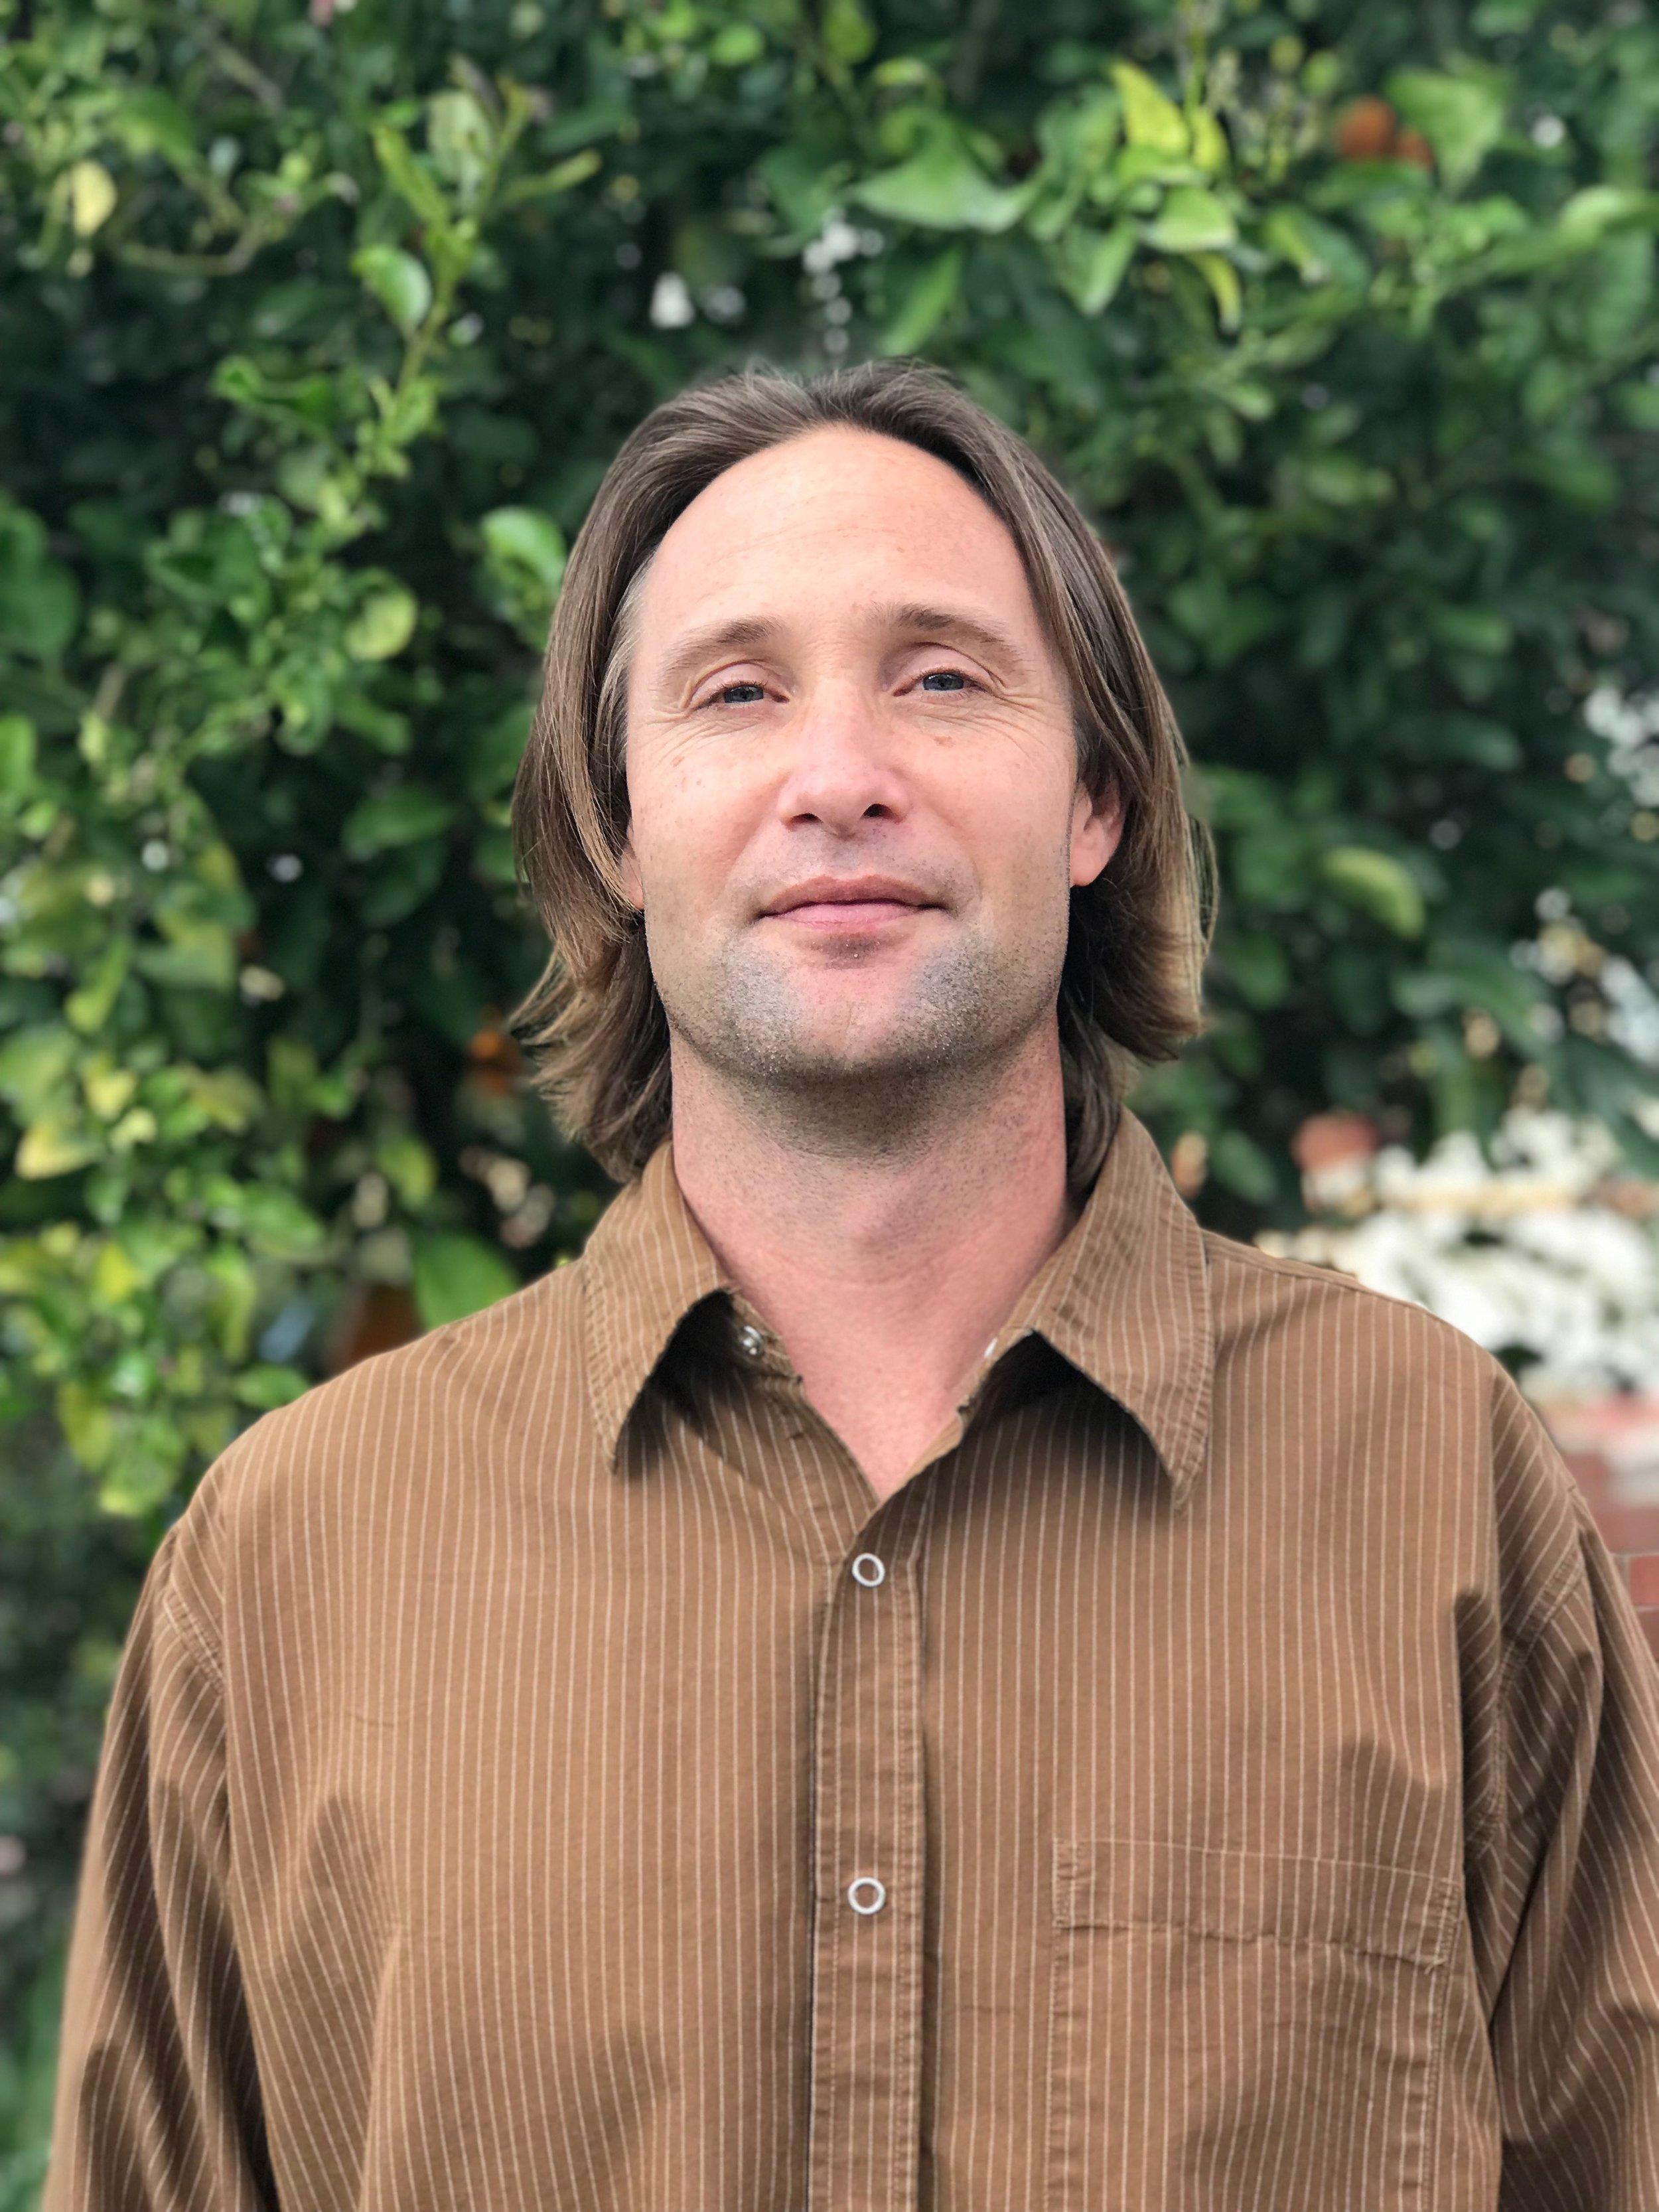 John Shideler, Turf Research Fellow